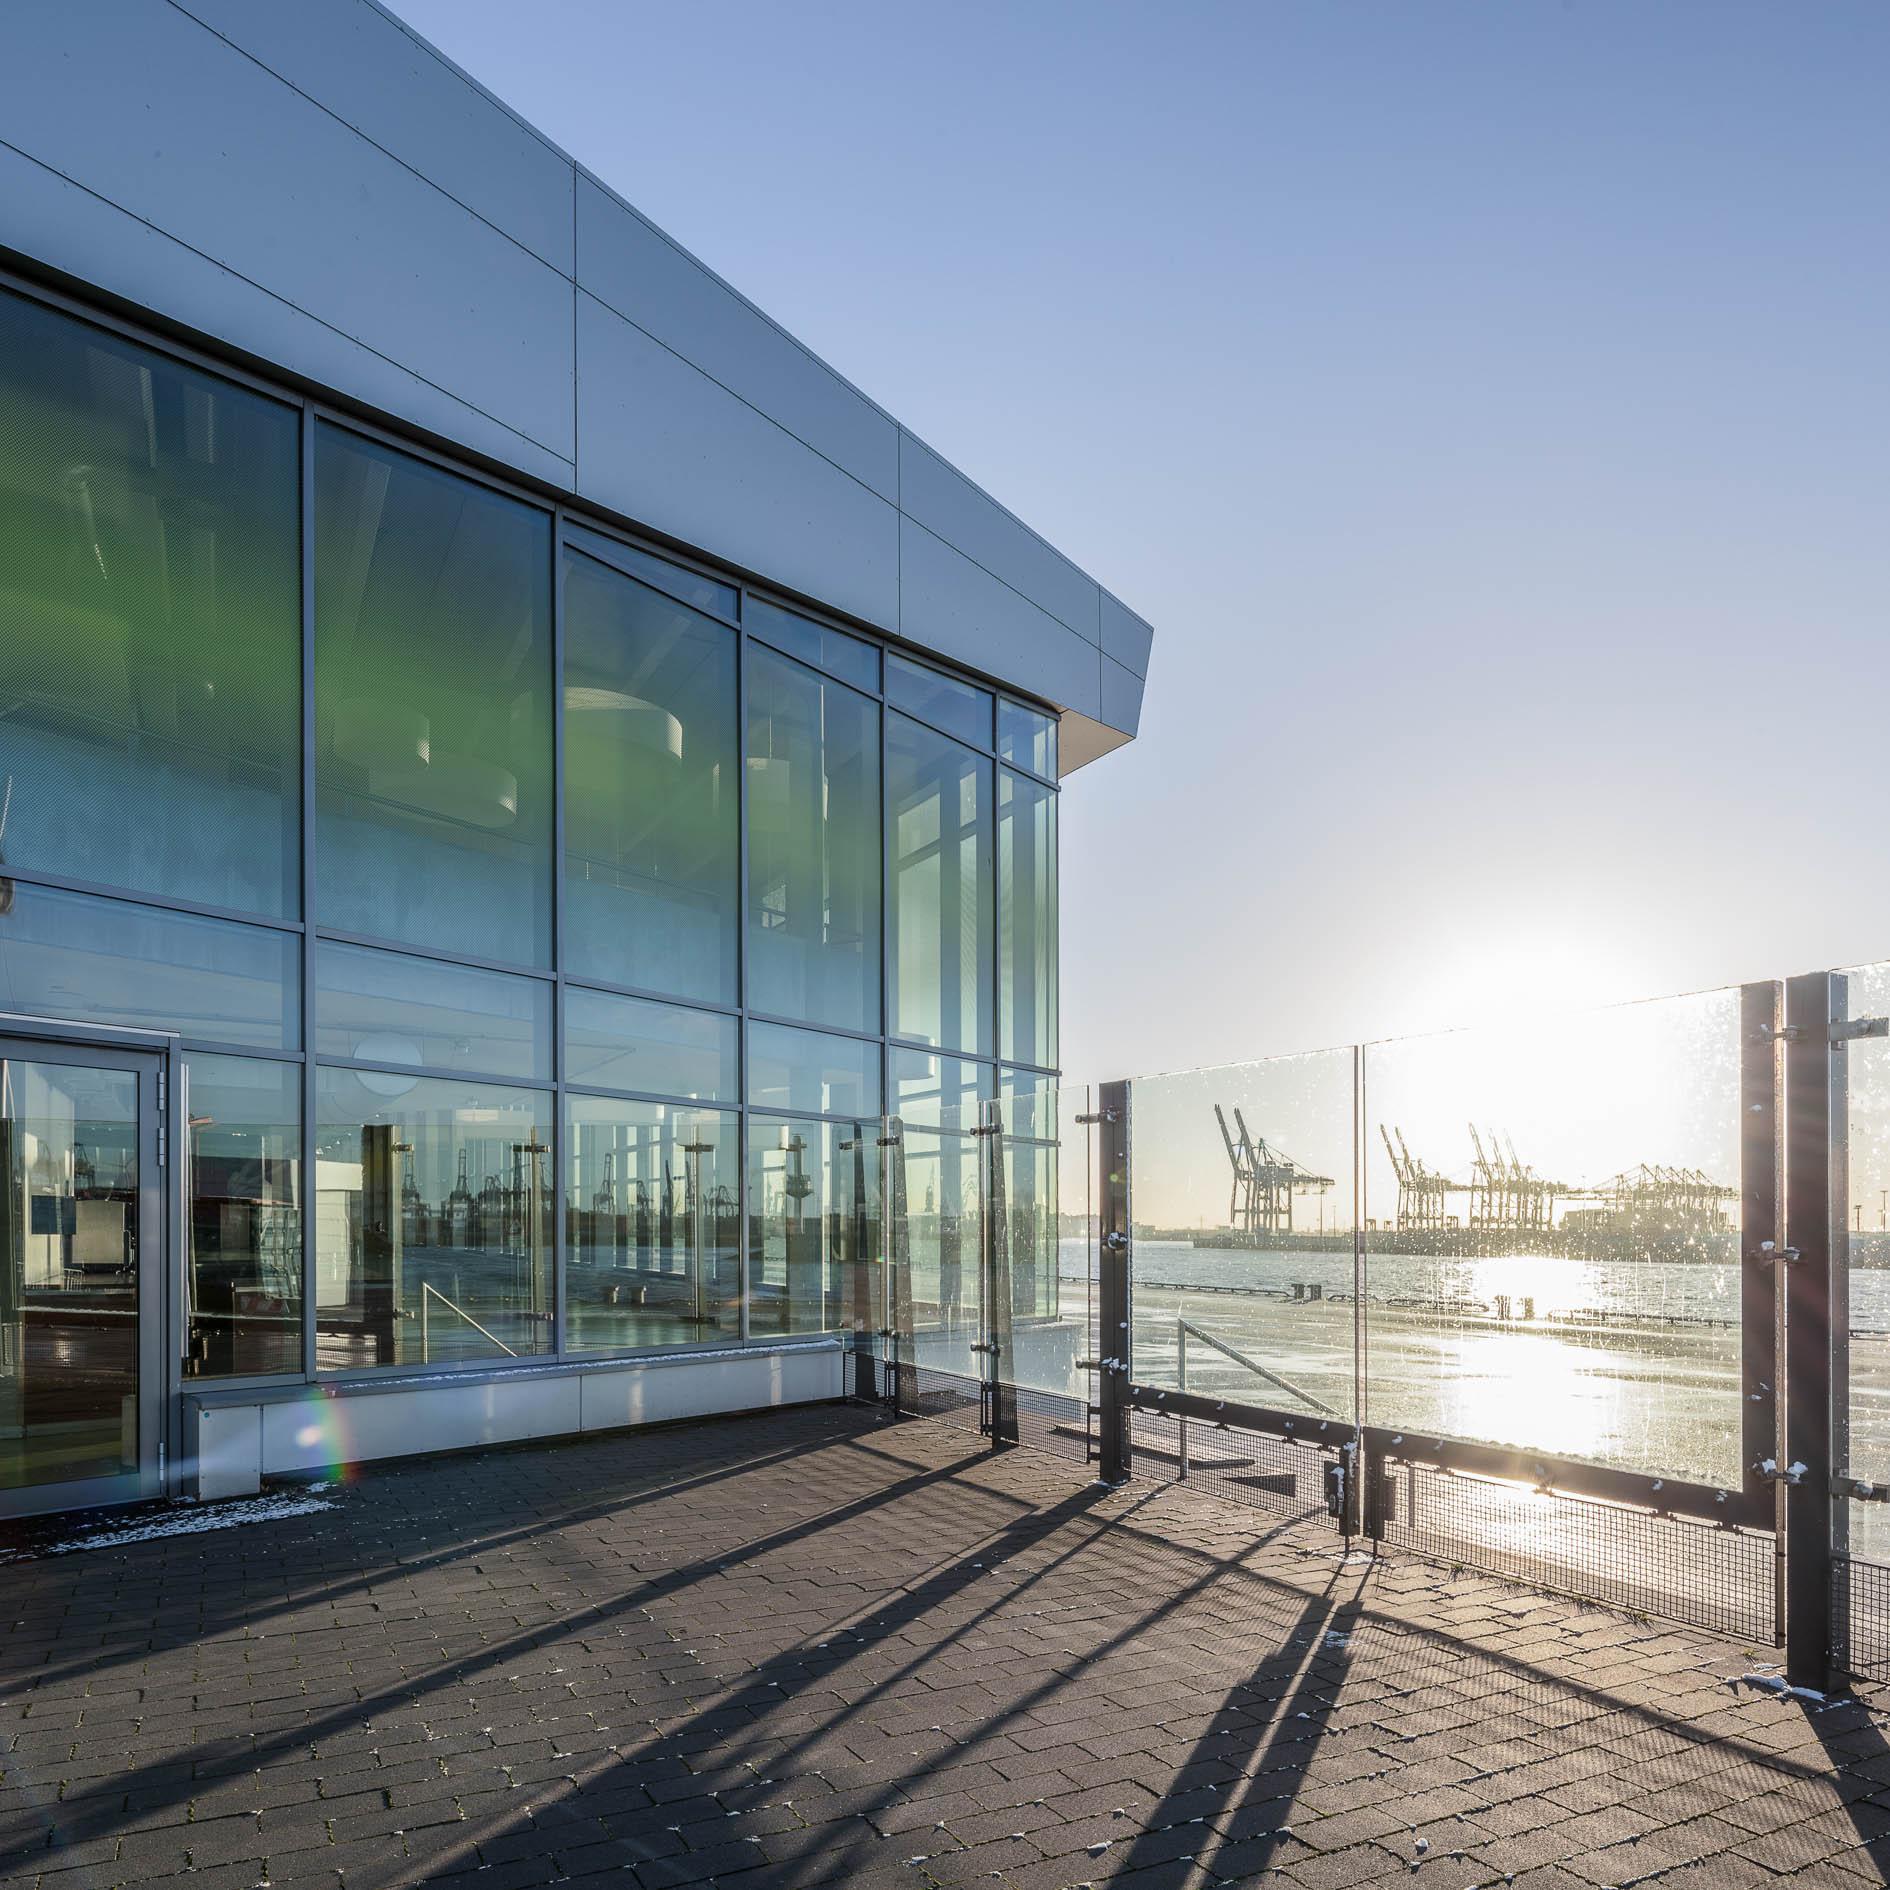 Hamburg cruise center altona urs kuester photography for Architekten hamburg altona